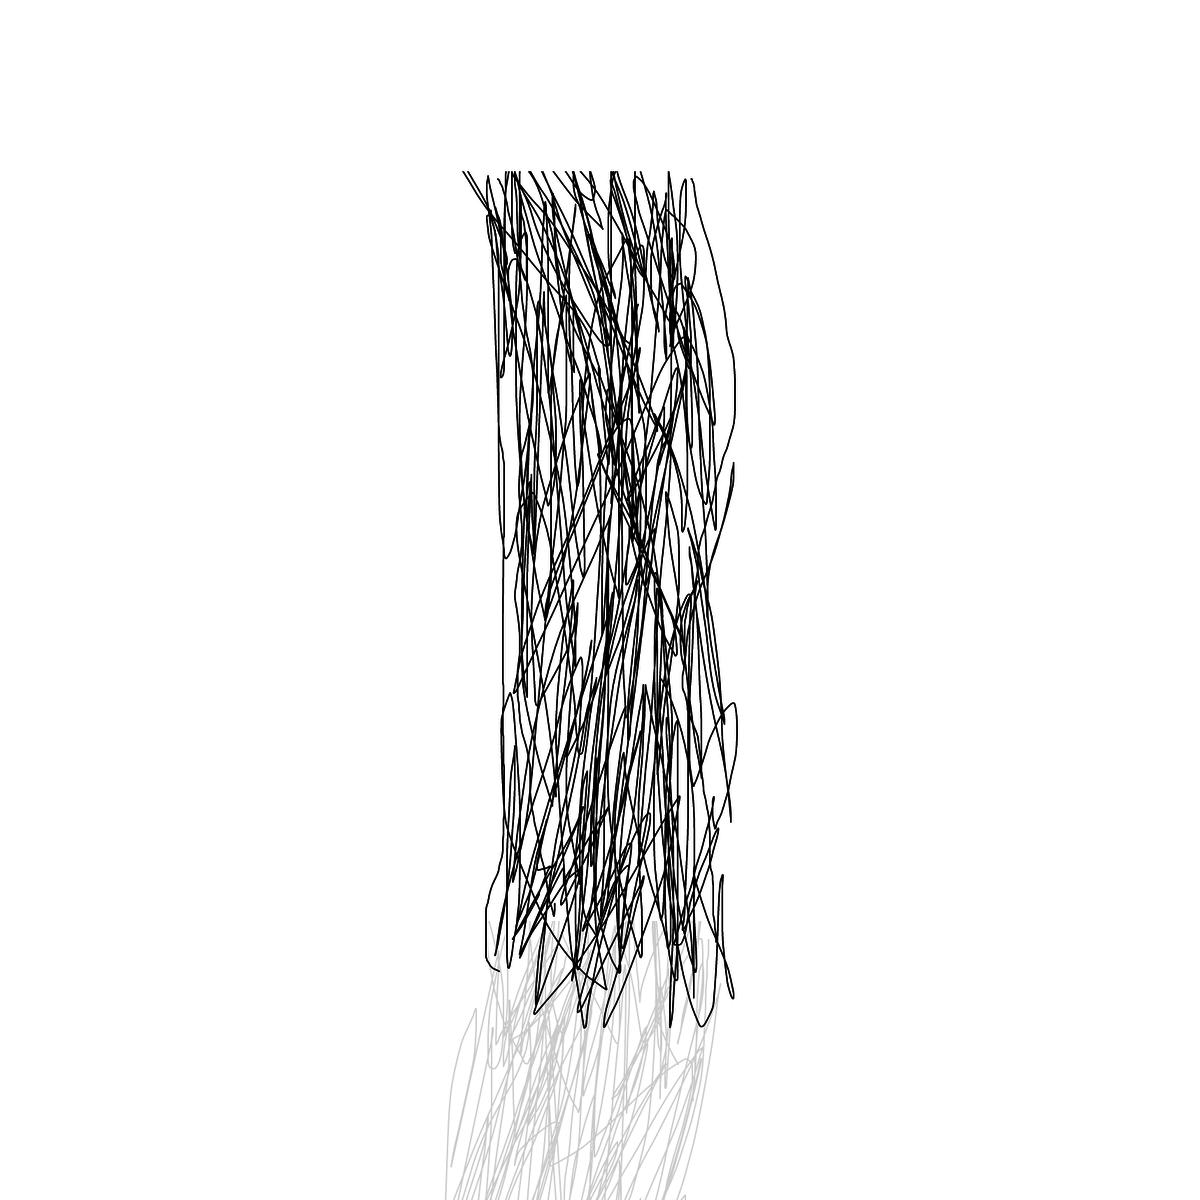 BAAAM drawing#6140 lat:51.3322677612304700lng: 12.3623380661010740